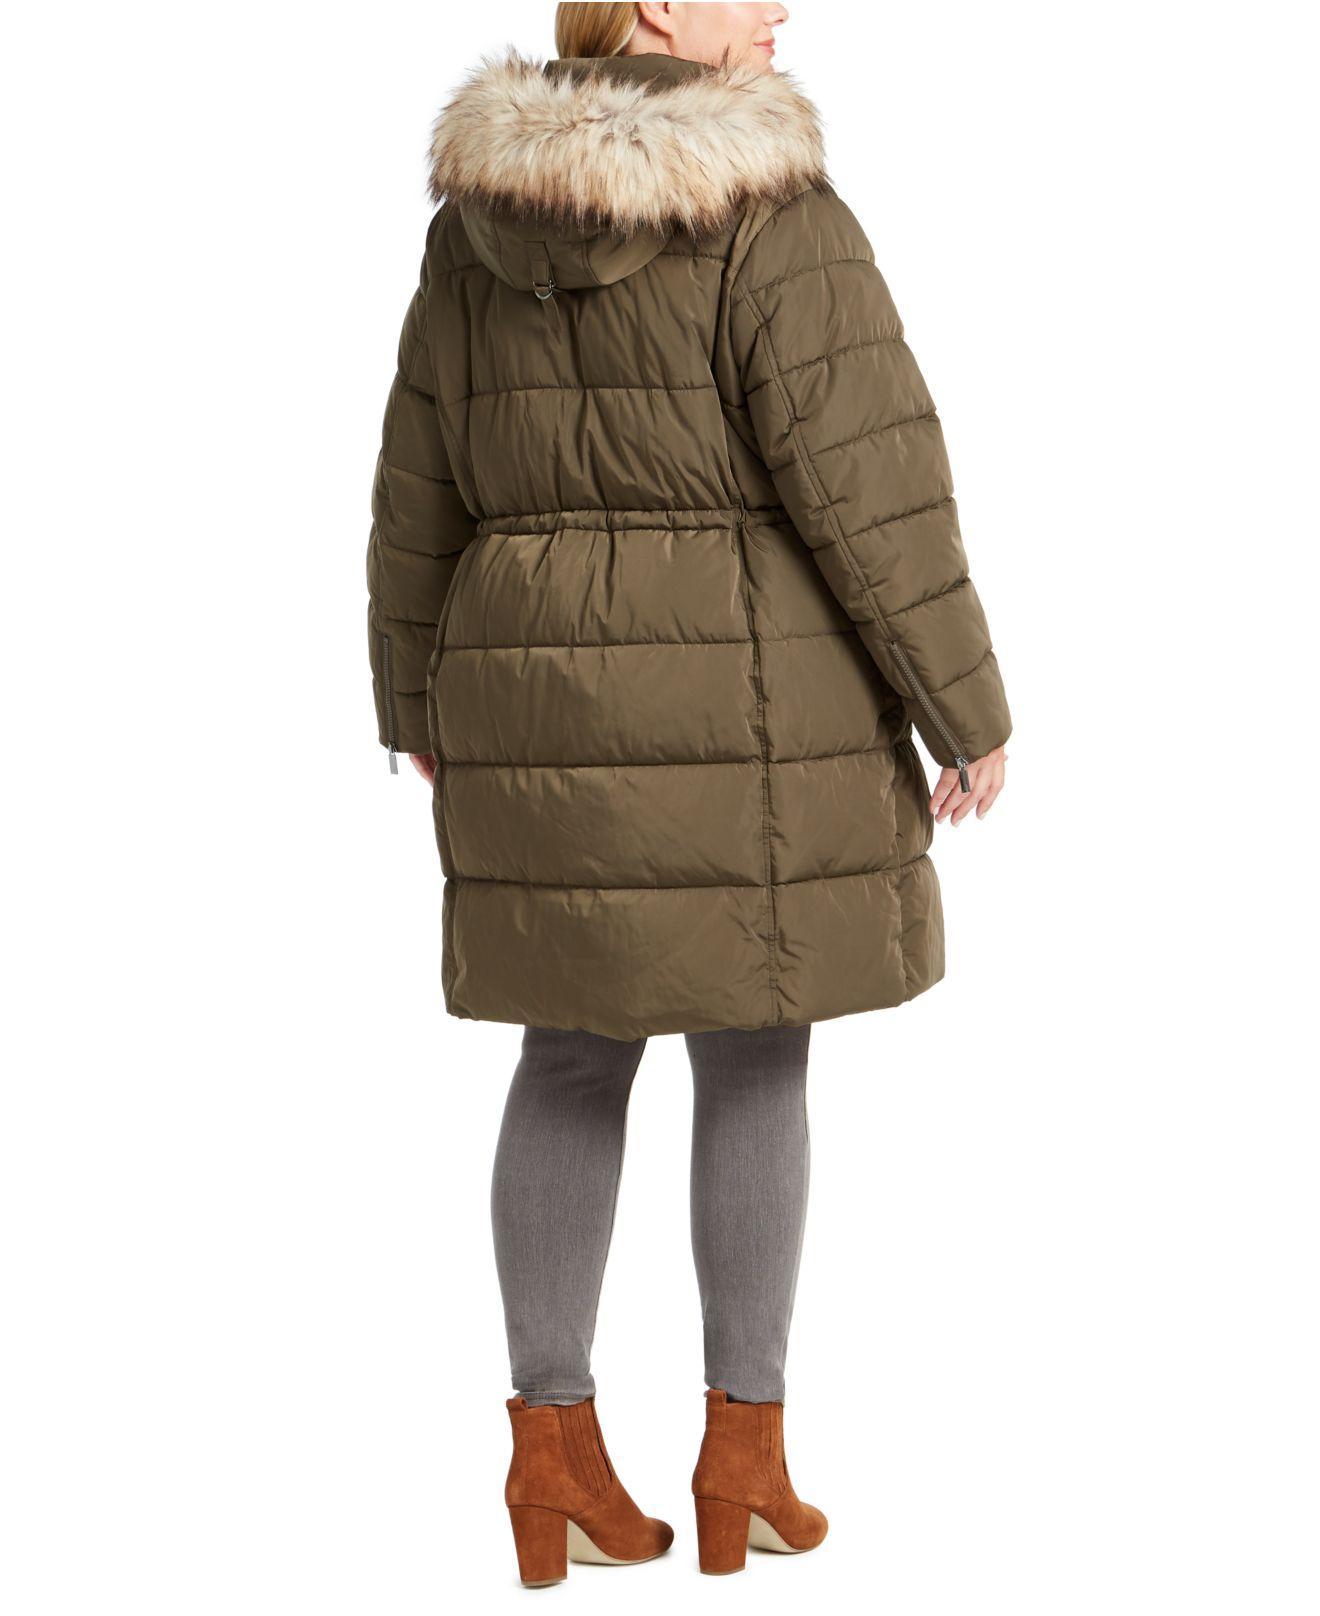 DKNY Plus Size Faux-fur Trim Hooded Anorak Puffer Coat - Lyst